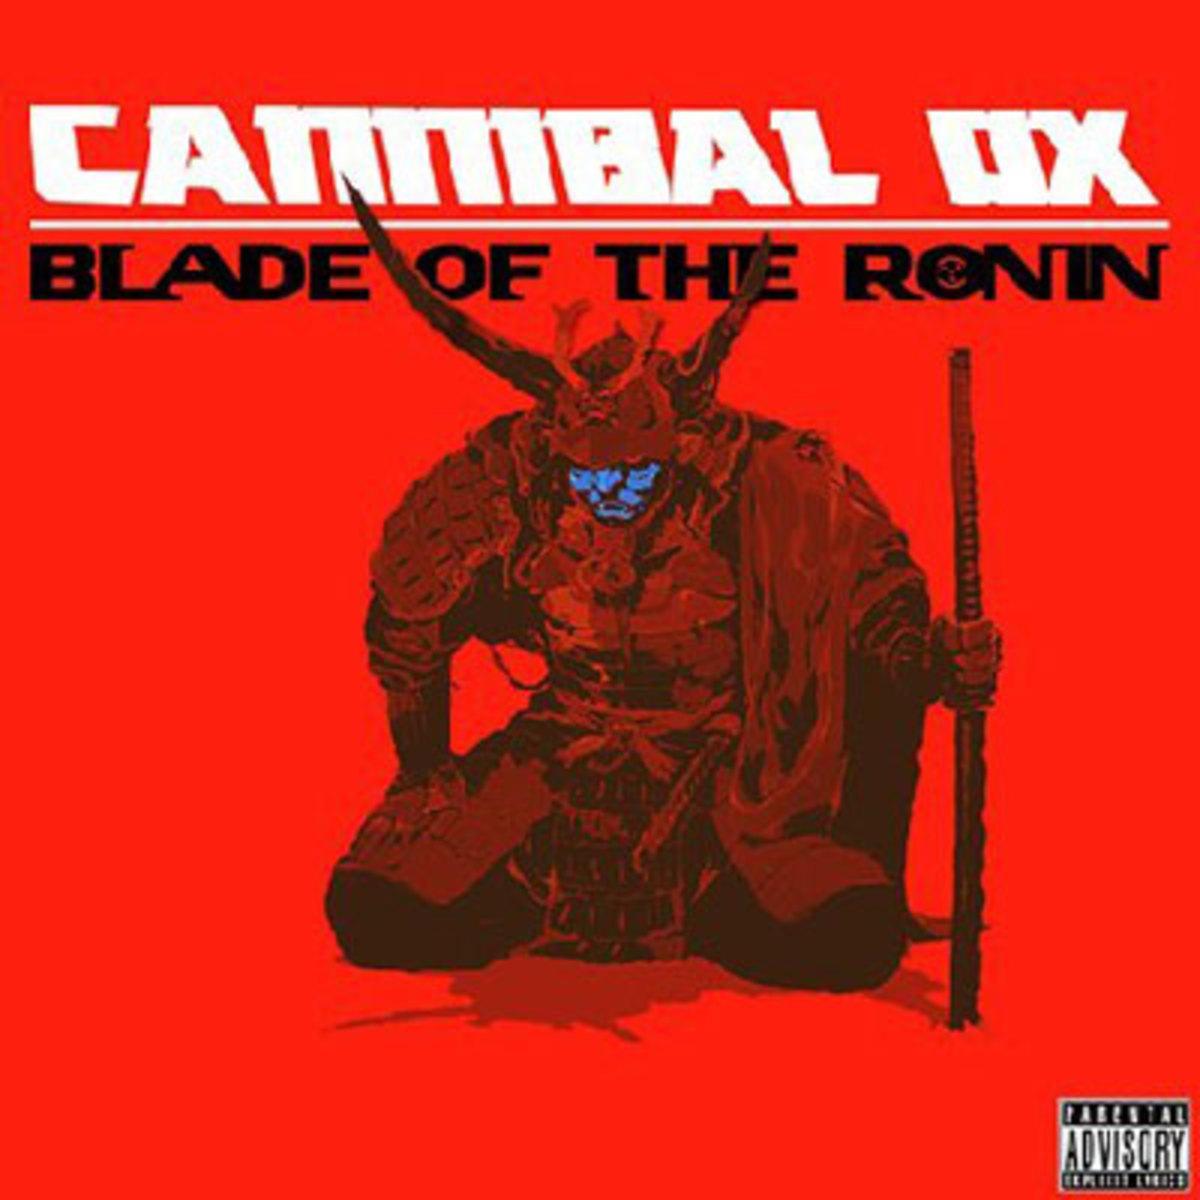 canibalox-bladeofronin.jpg